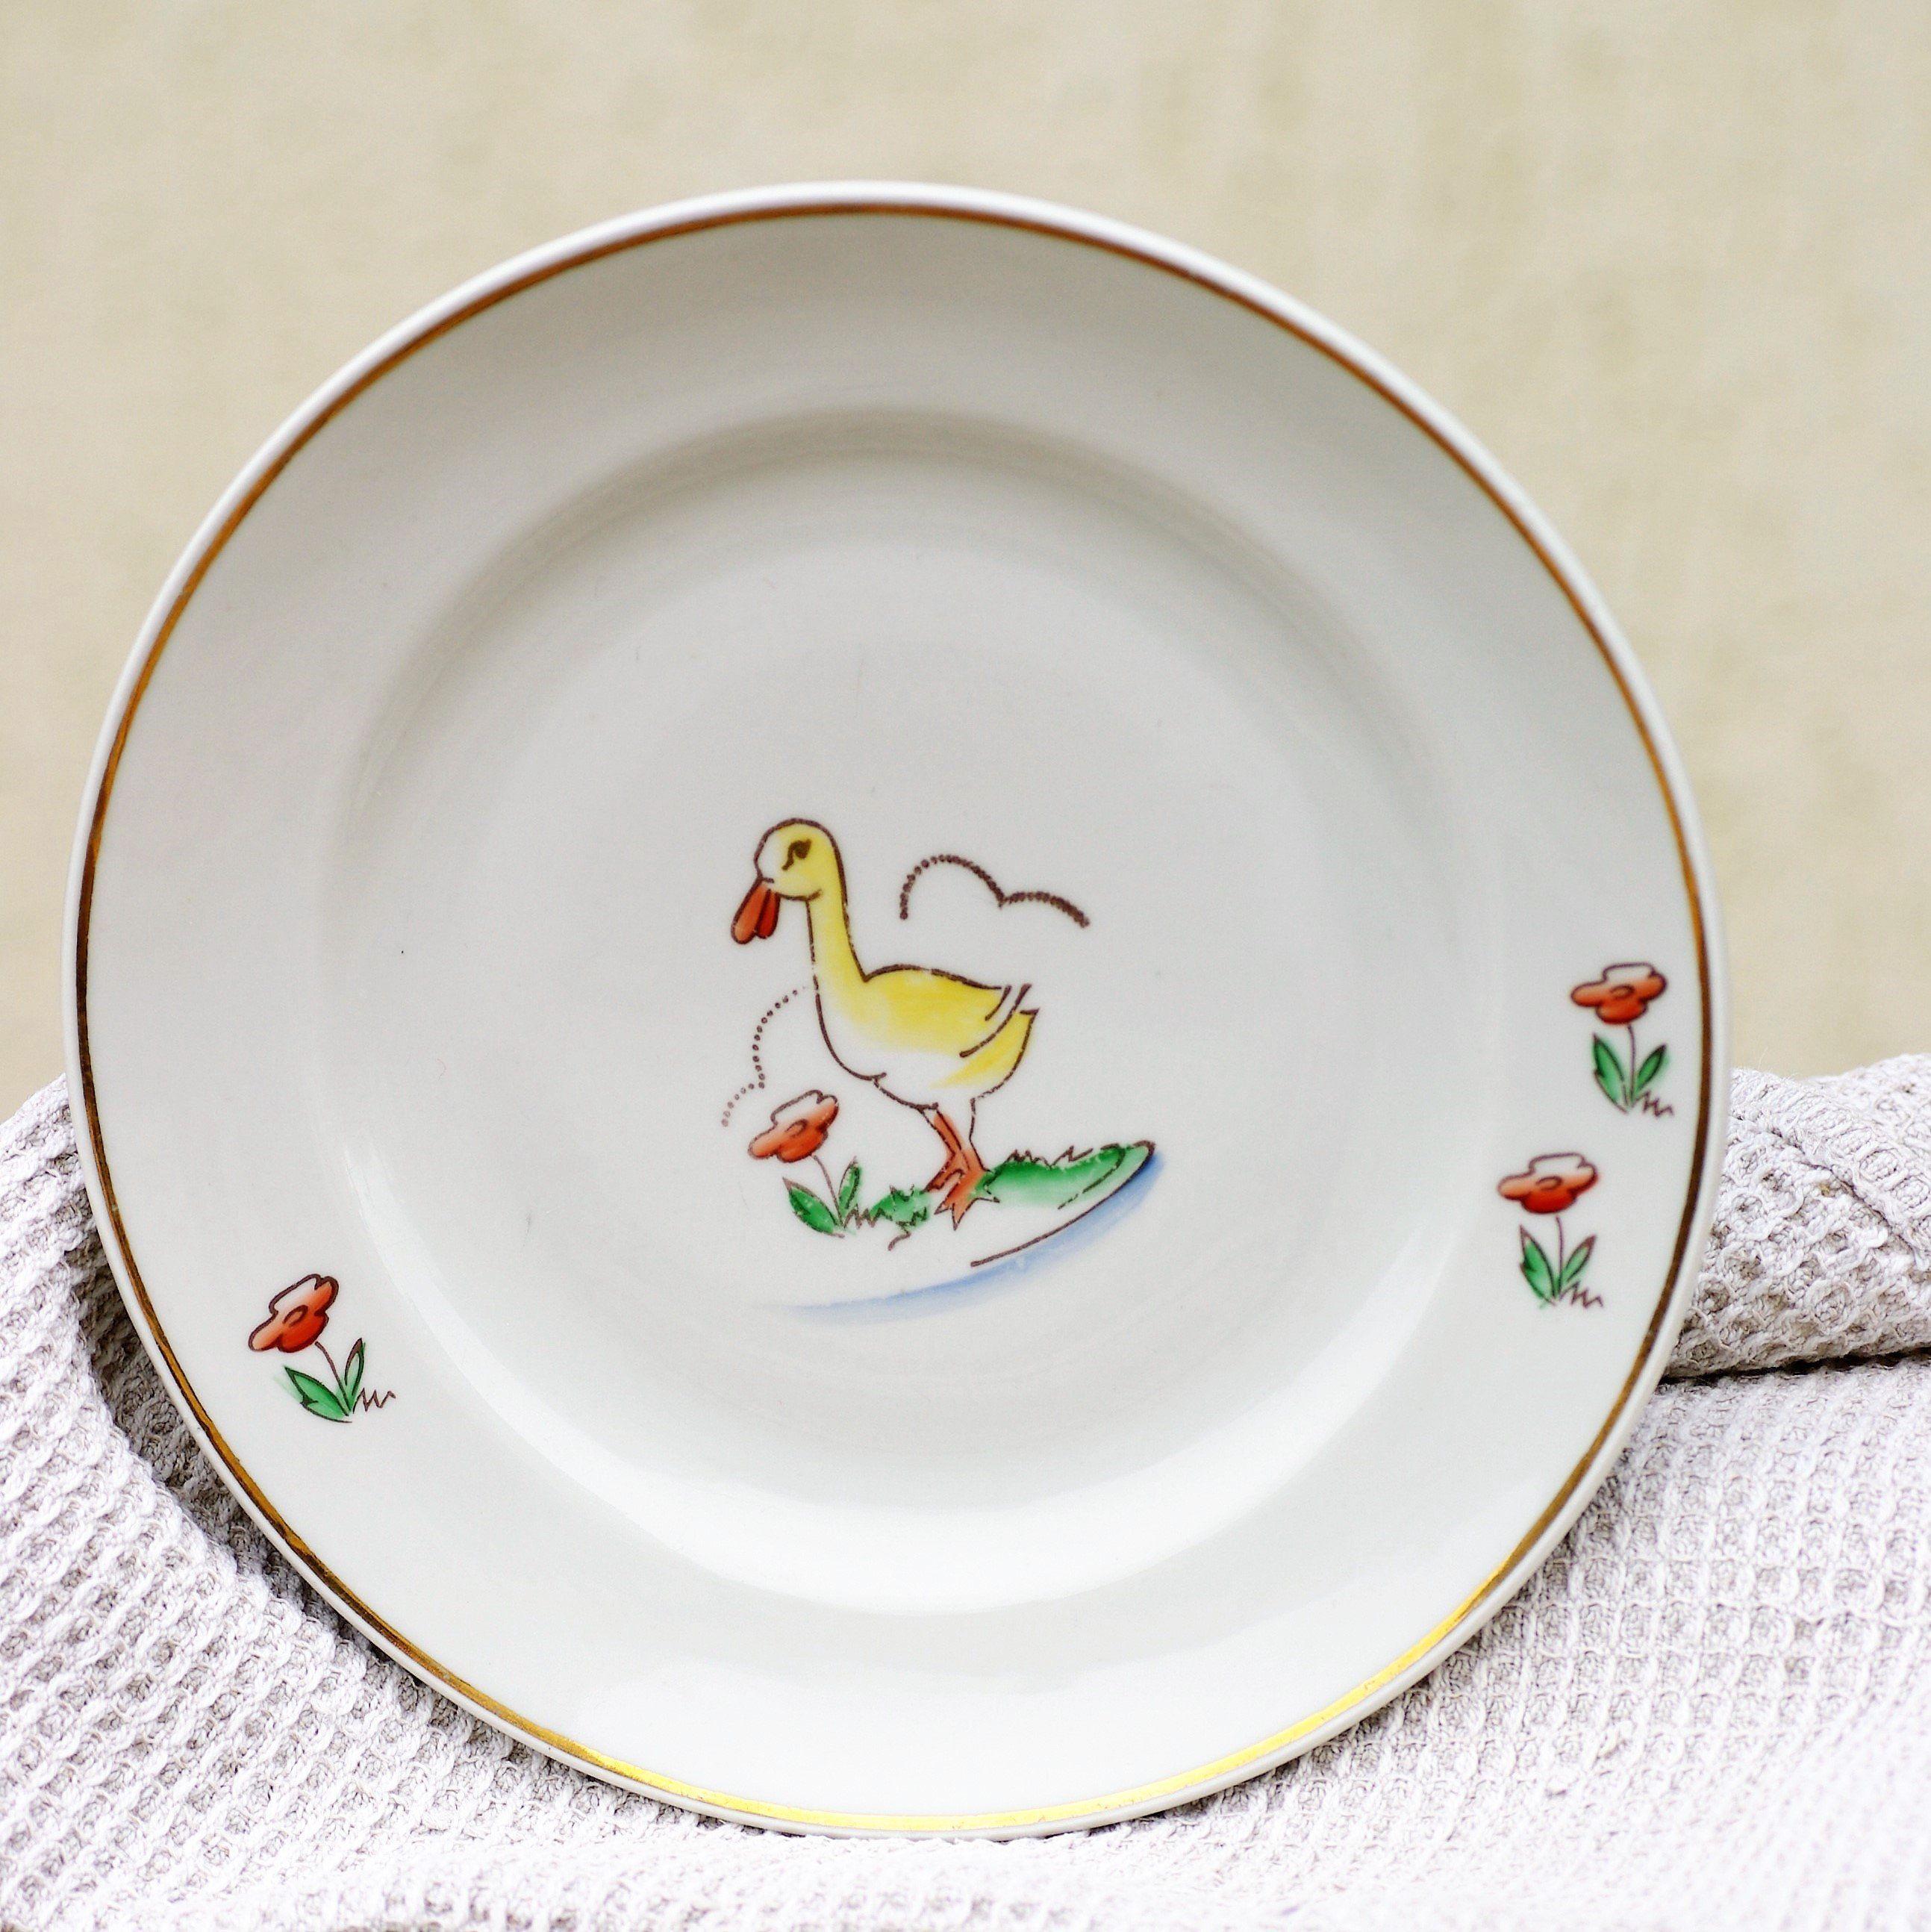 Soviet Kids Plate 1970s Childs Plate Children Soviet Tableware Duck And Flowers Farmhouse Kitchen Riga Porcelain Kids Plates Kids Dishware Tableware